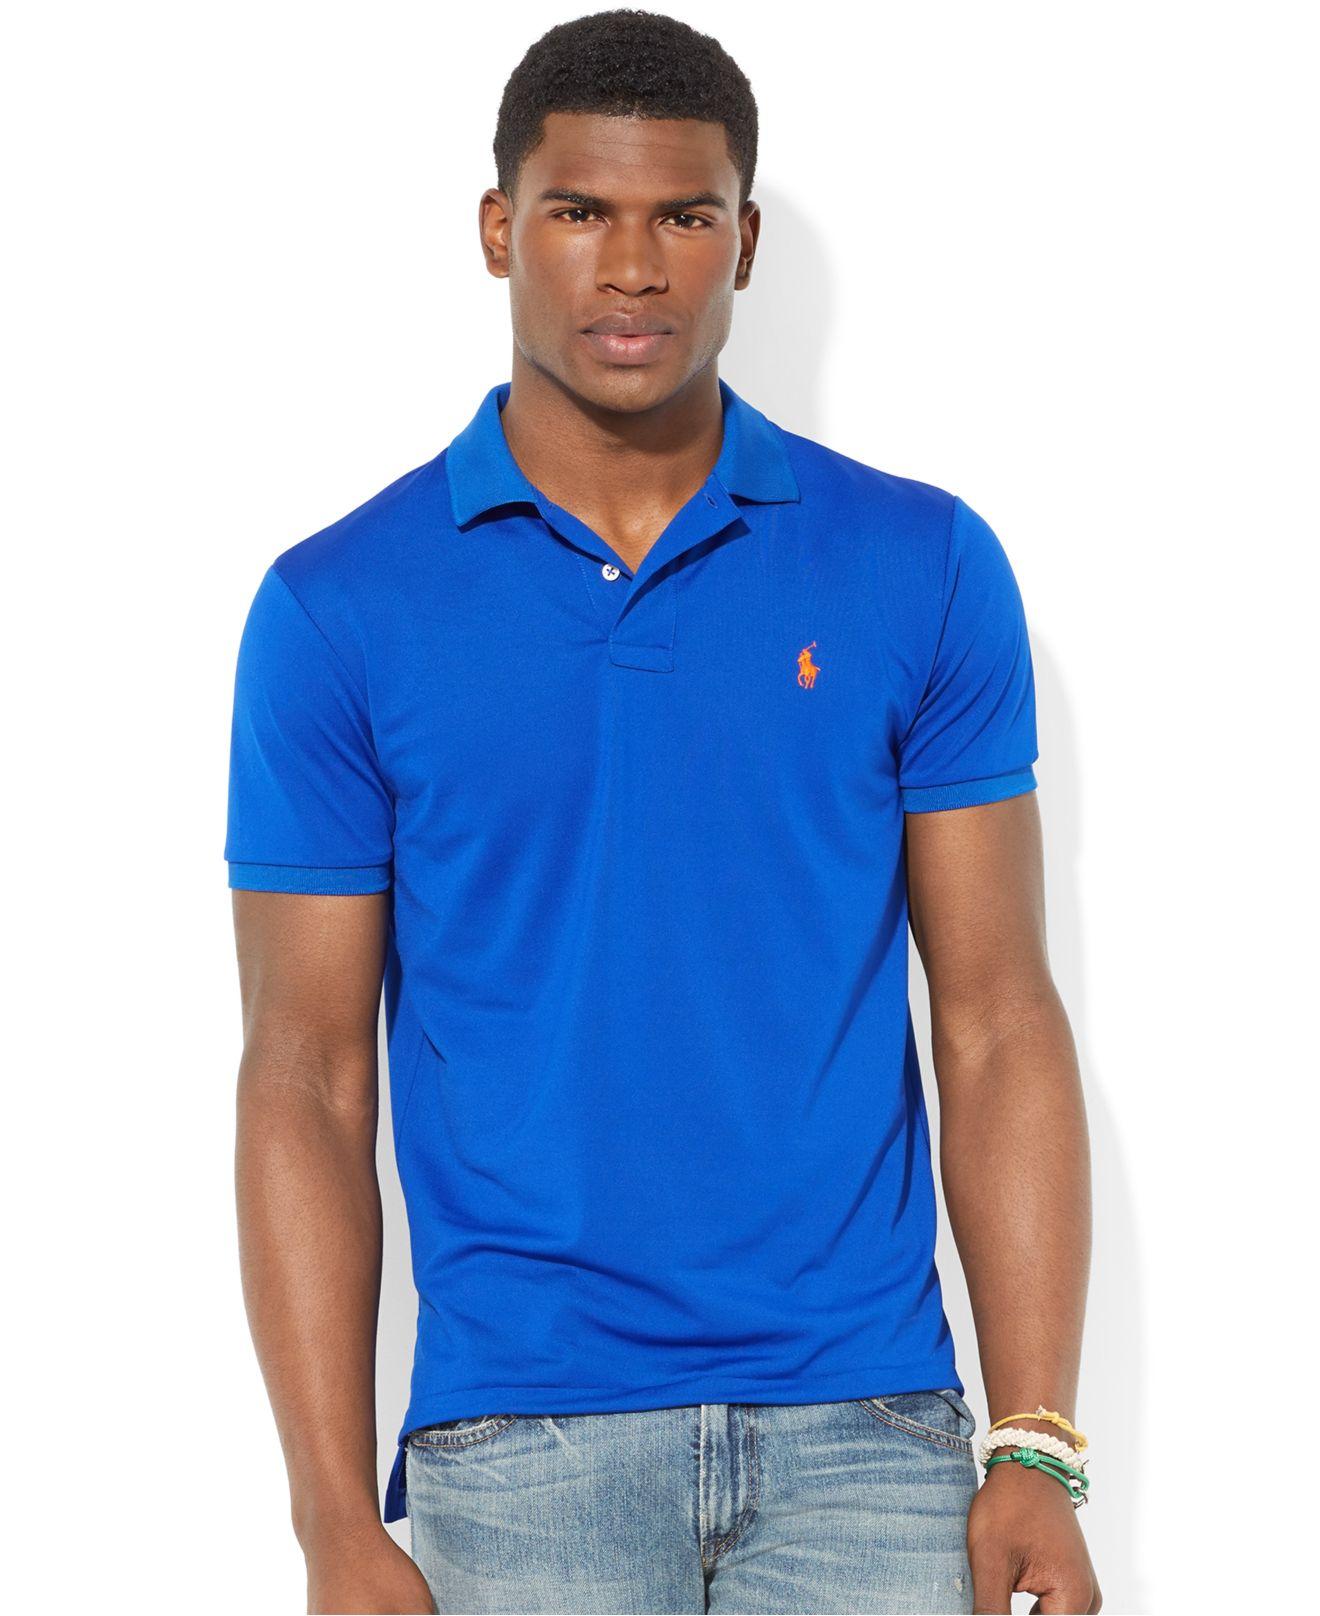 Lyst Polo Ralph Lauren Performance Mesh Polo In Blue For Men